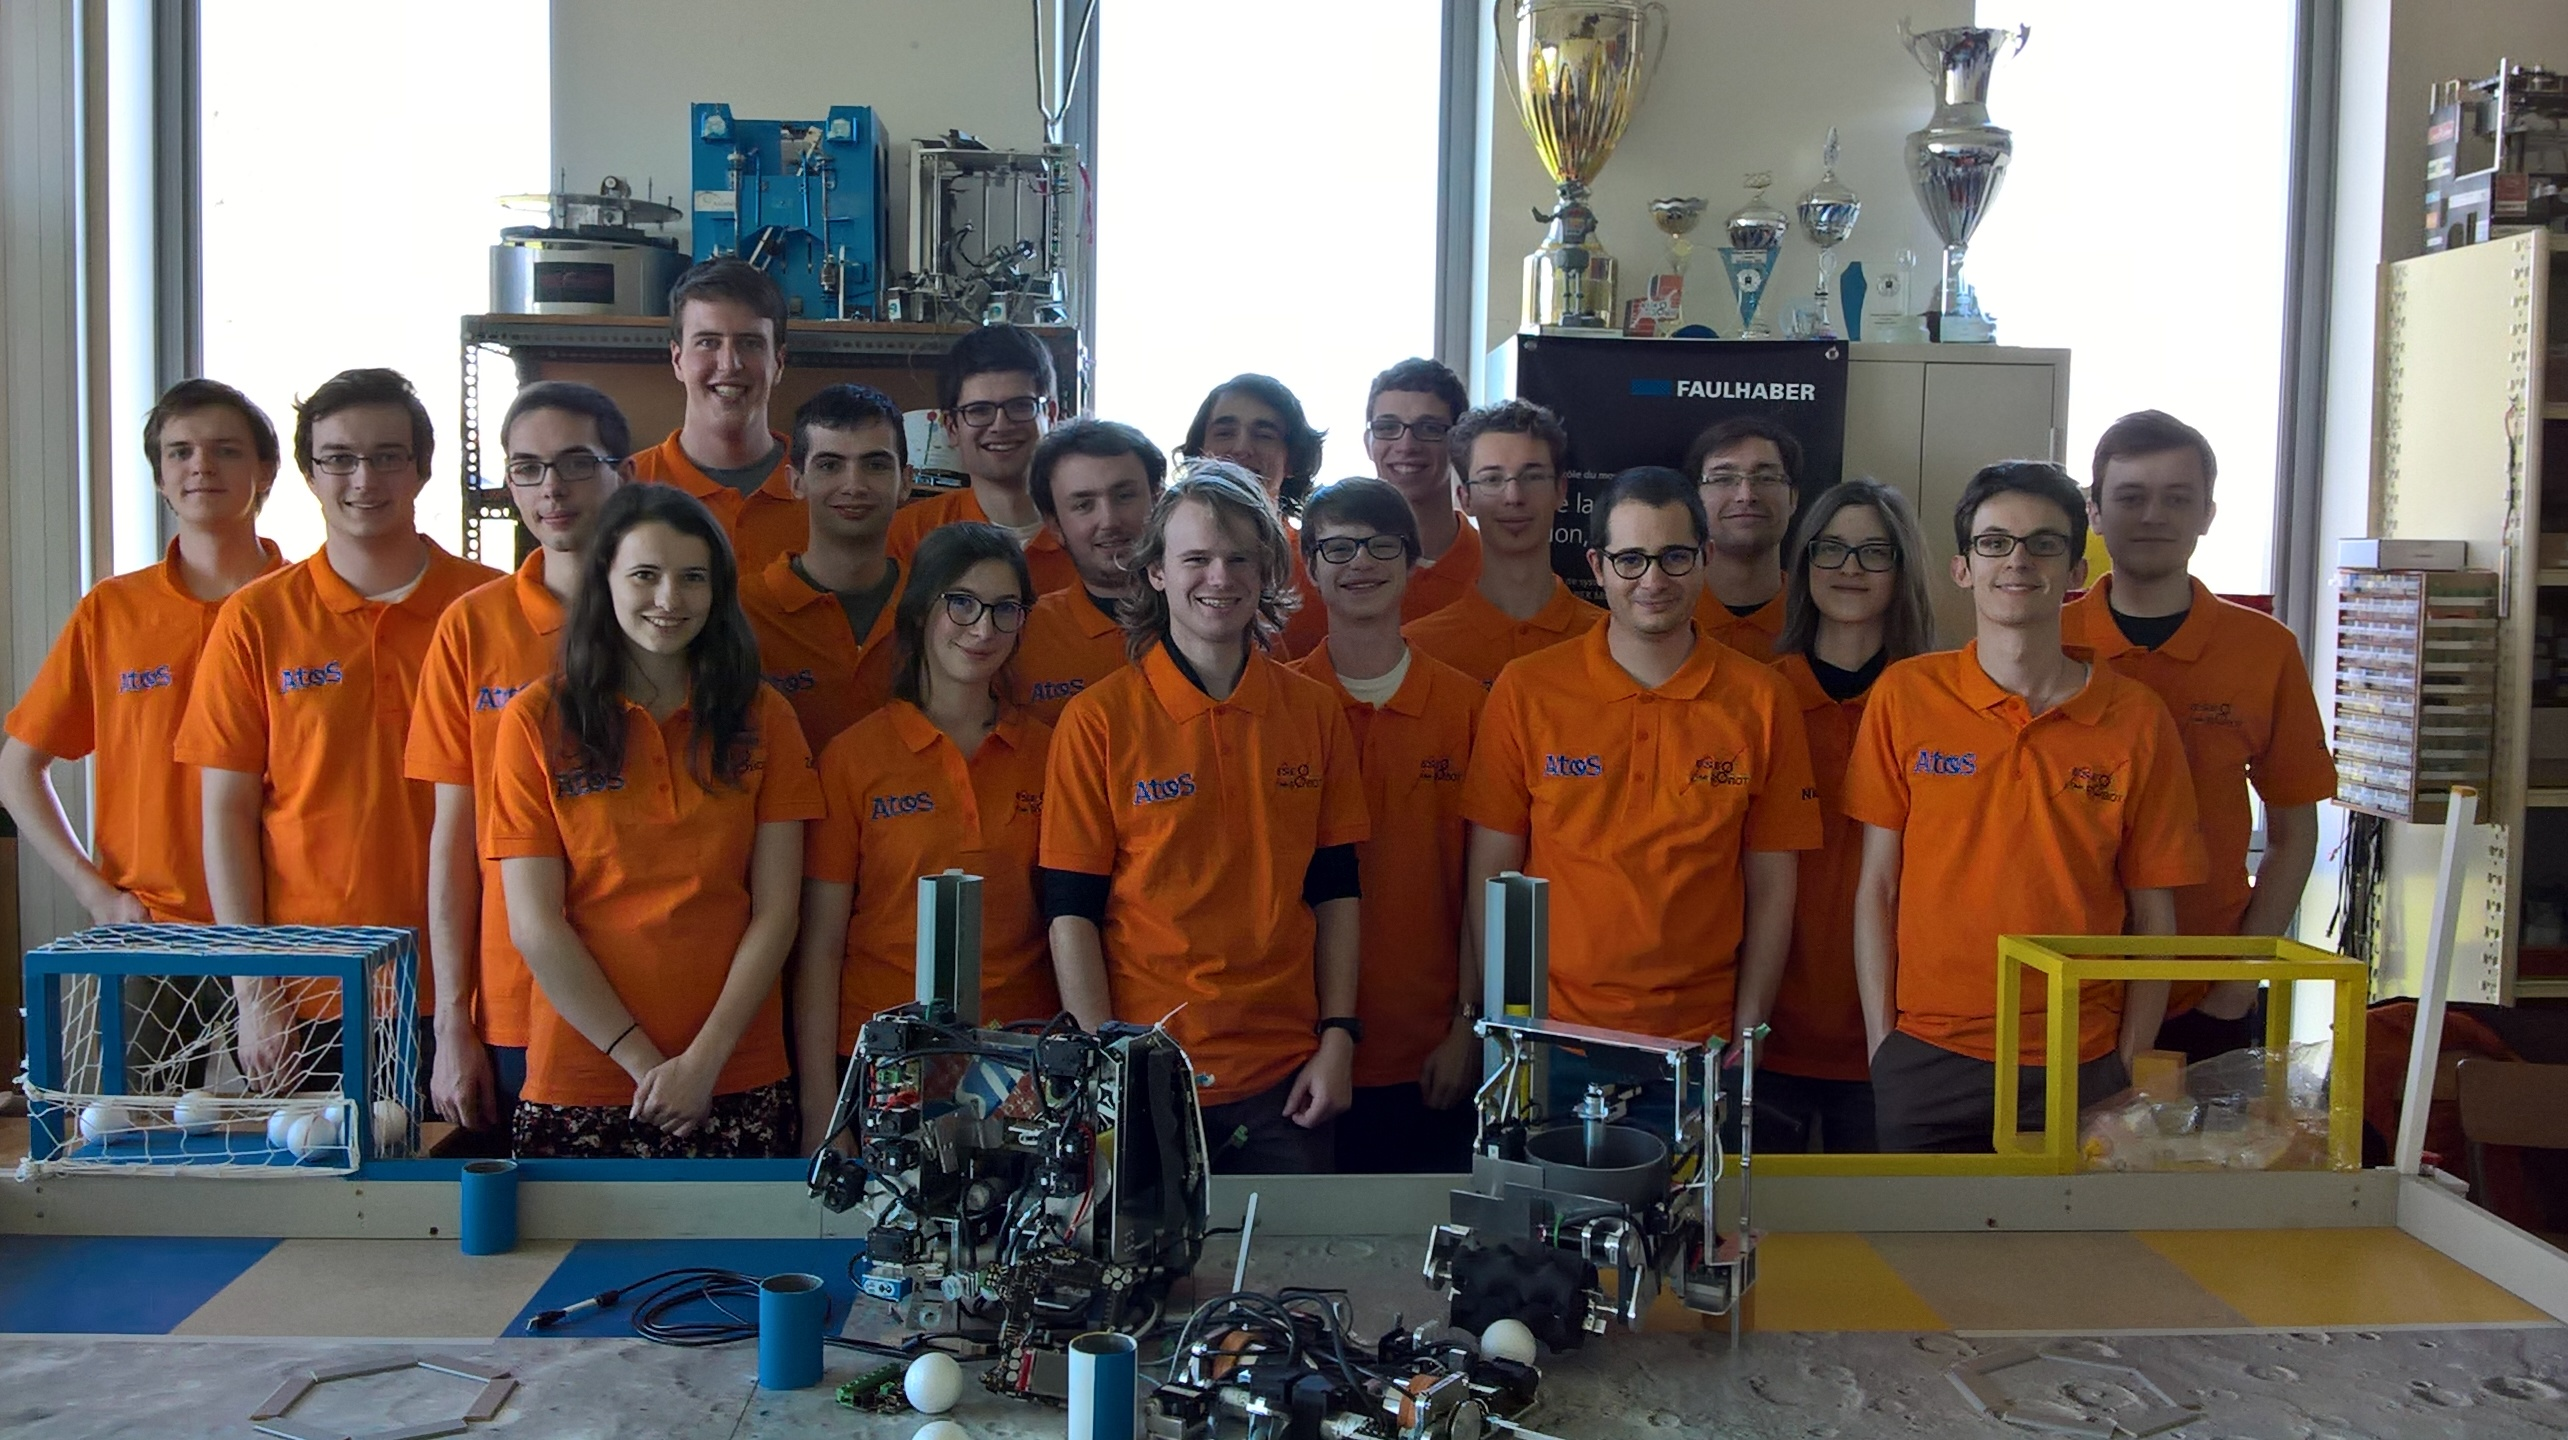 L'équipe Robot ESEO 2017